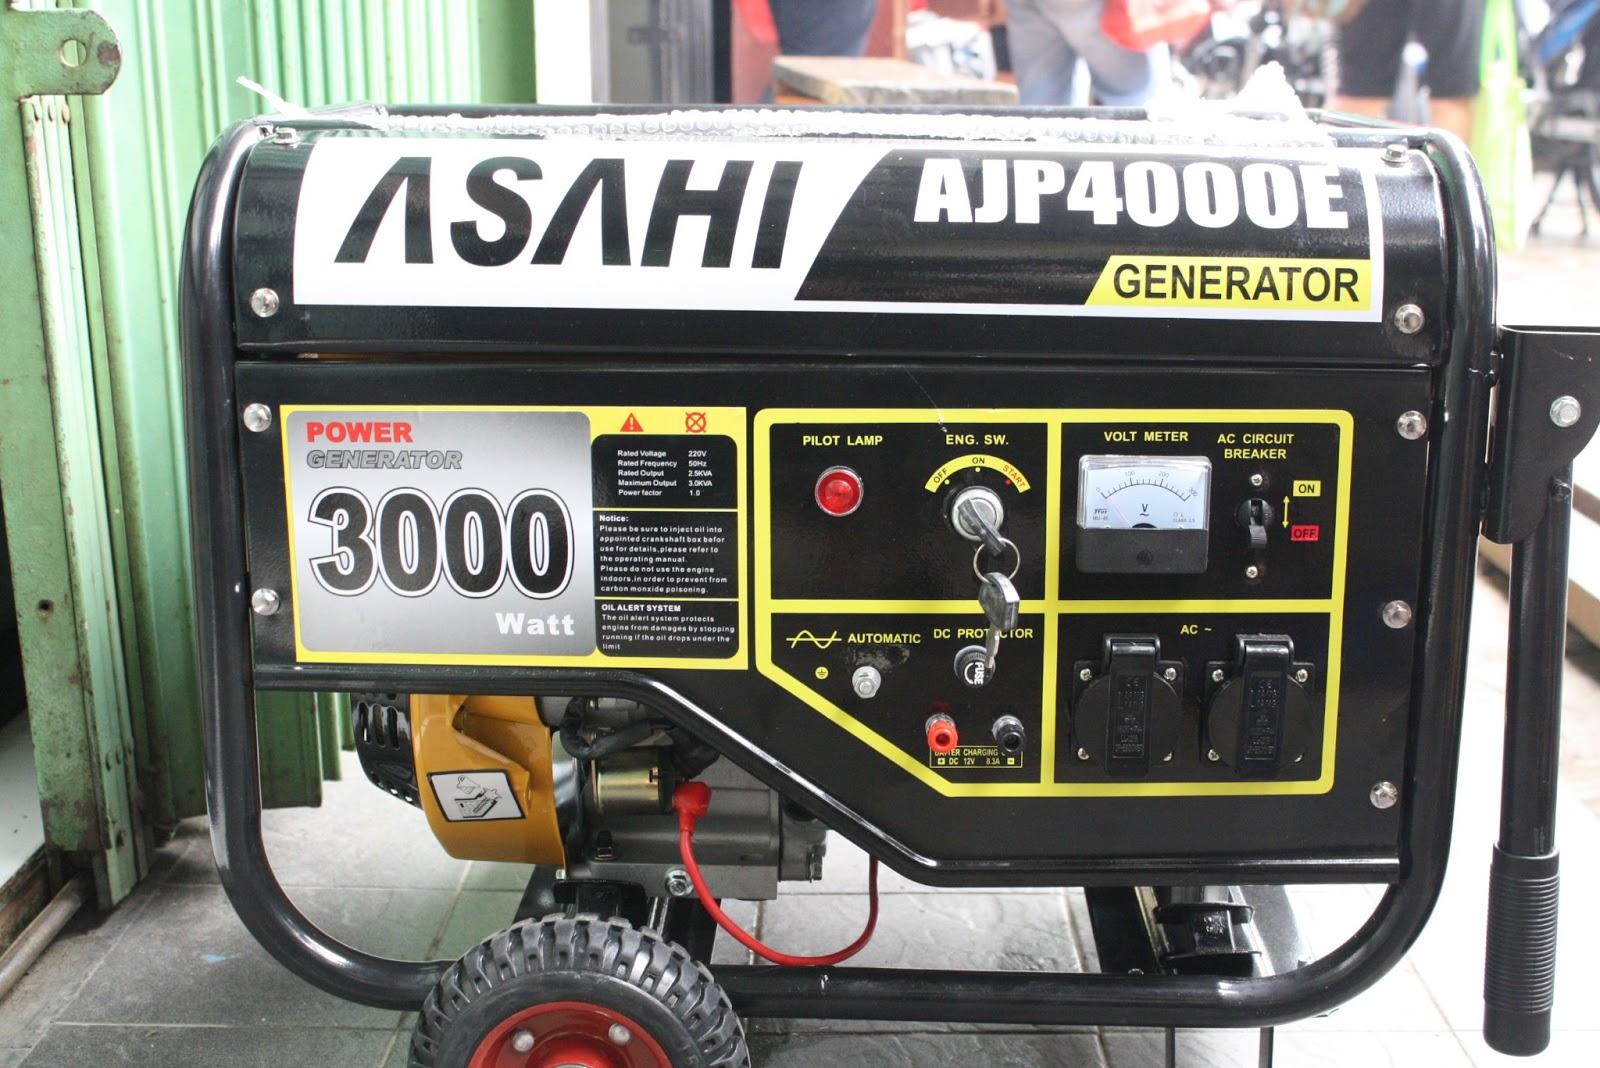 honda diesel generator. GENSET MURAH \u0026 EKONOMIS BERGARANSI Honda Diesel Generator V